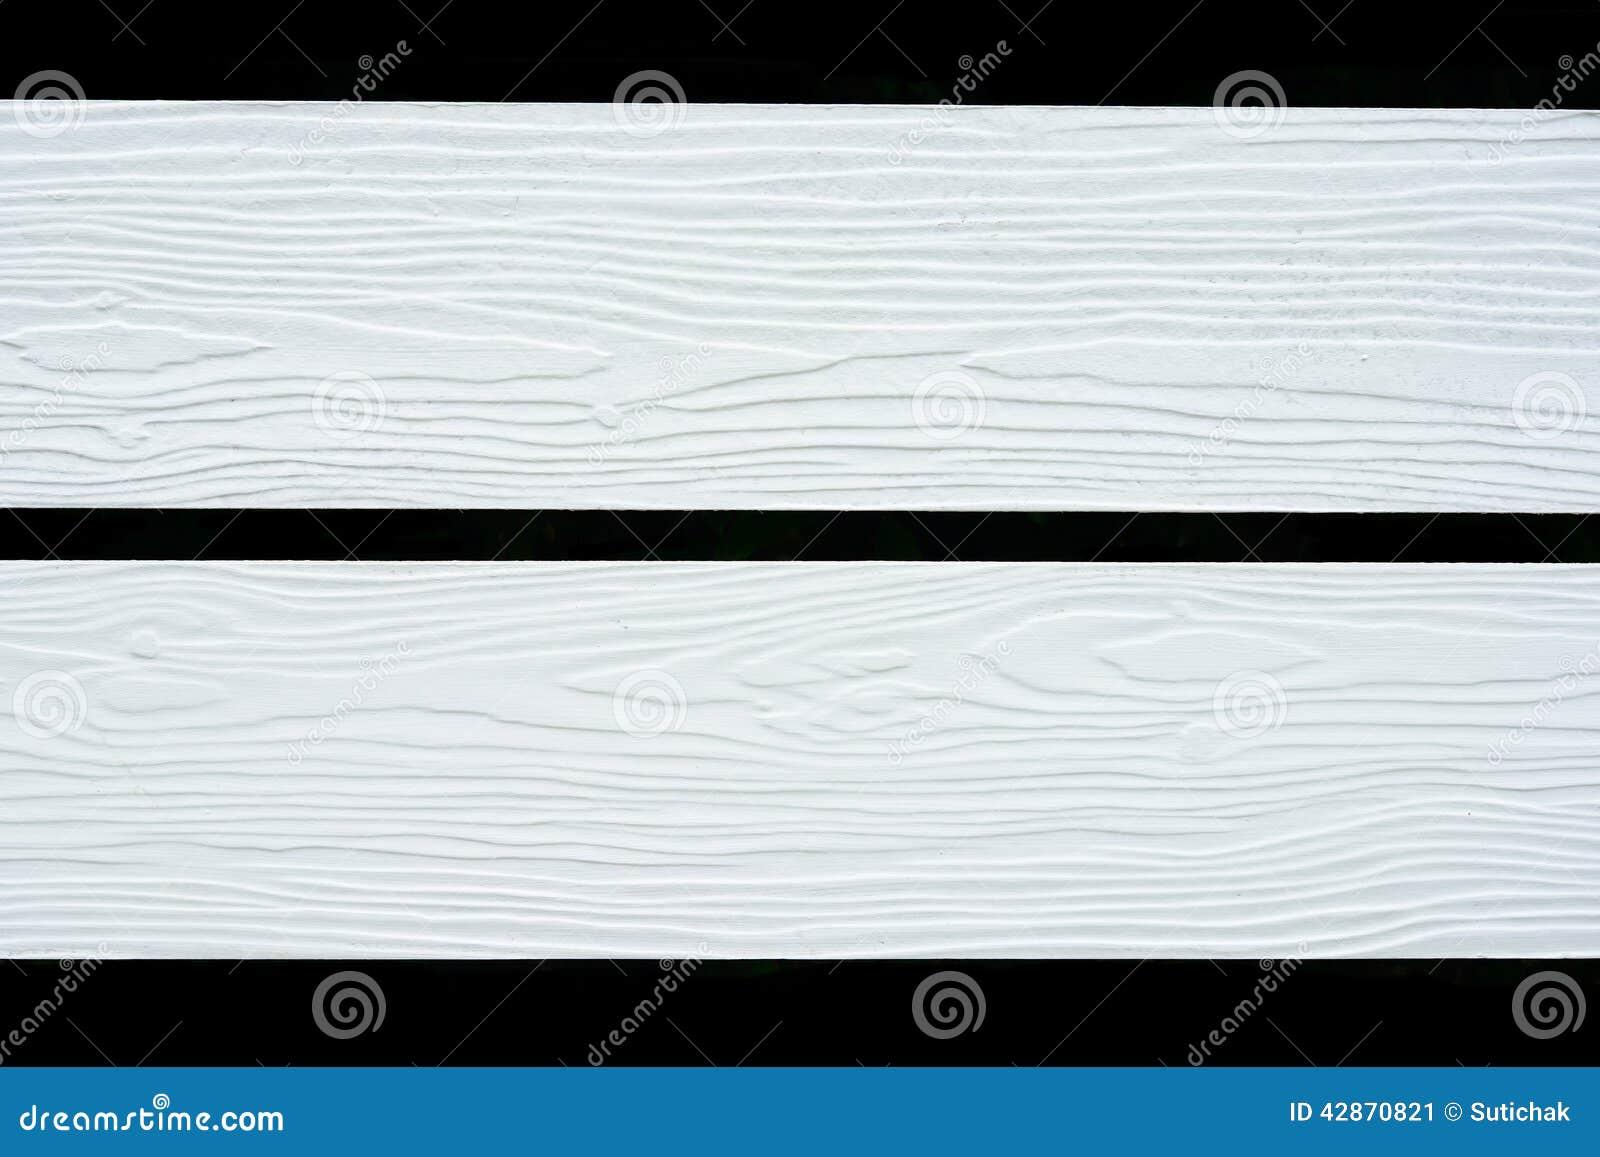 White wood plank texture